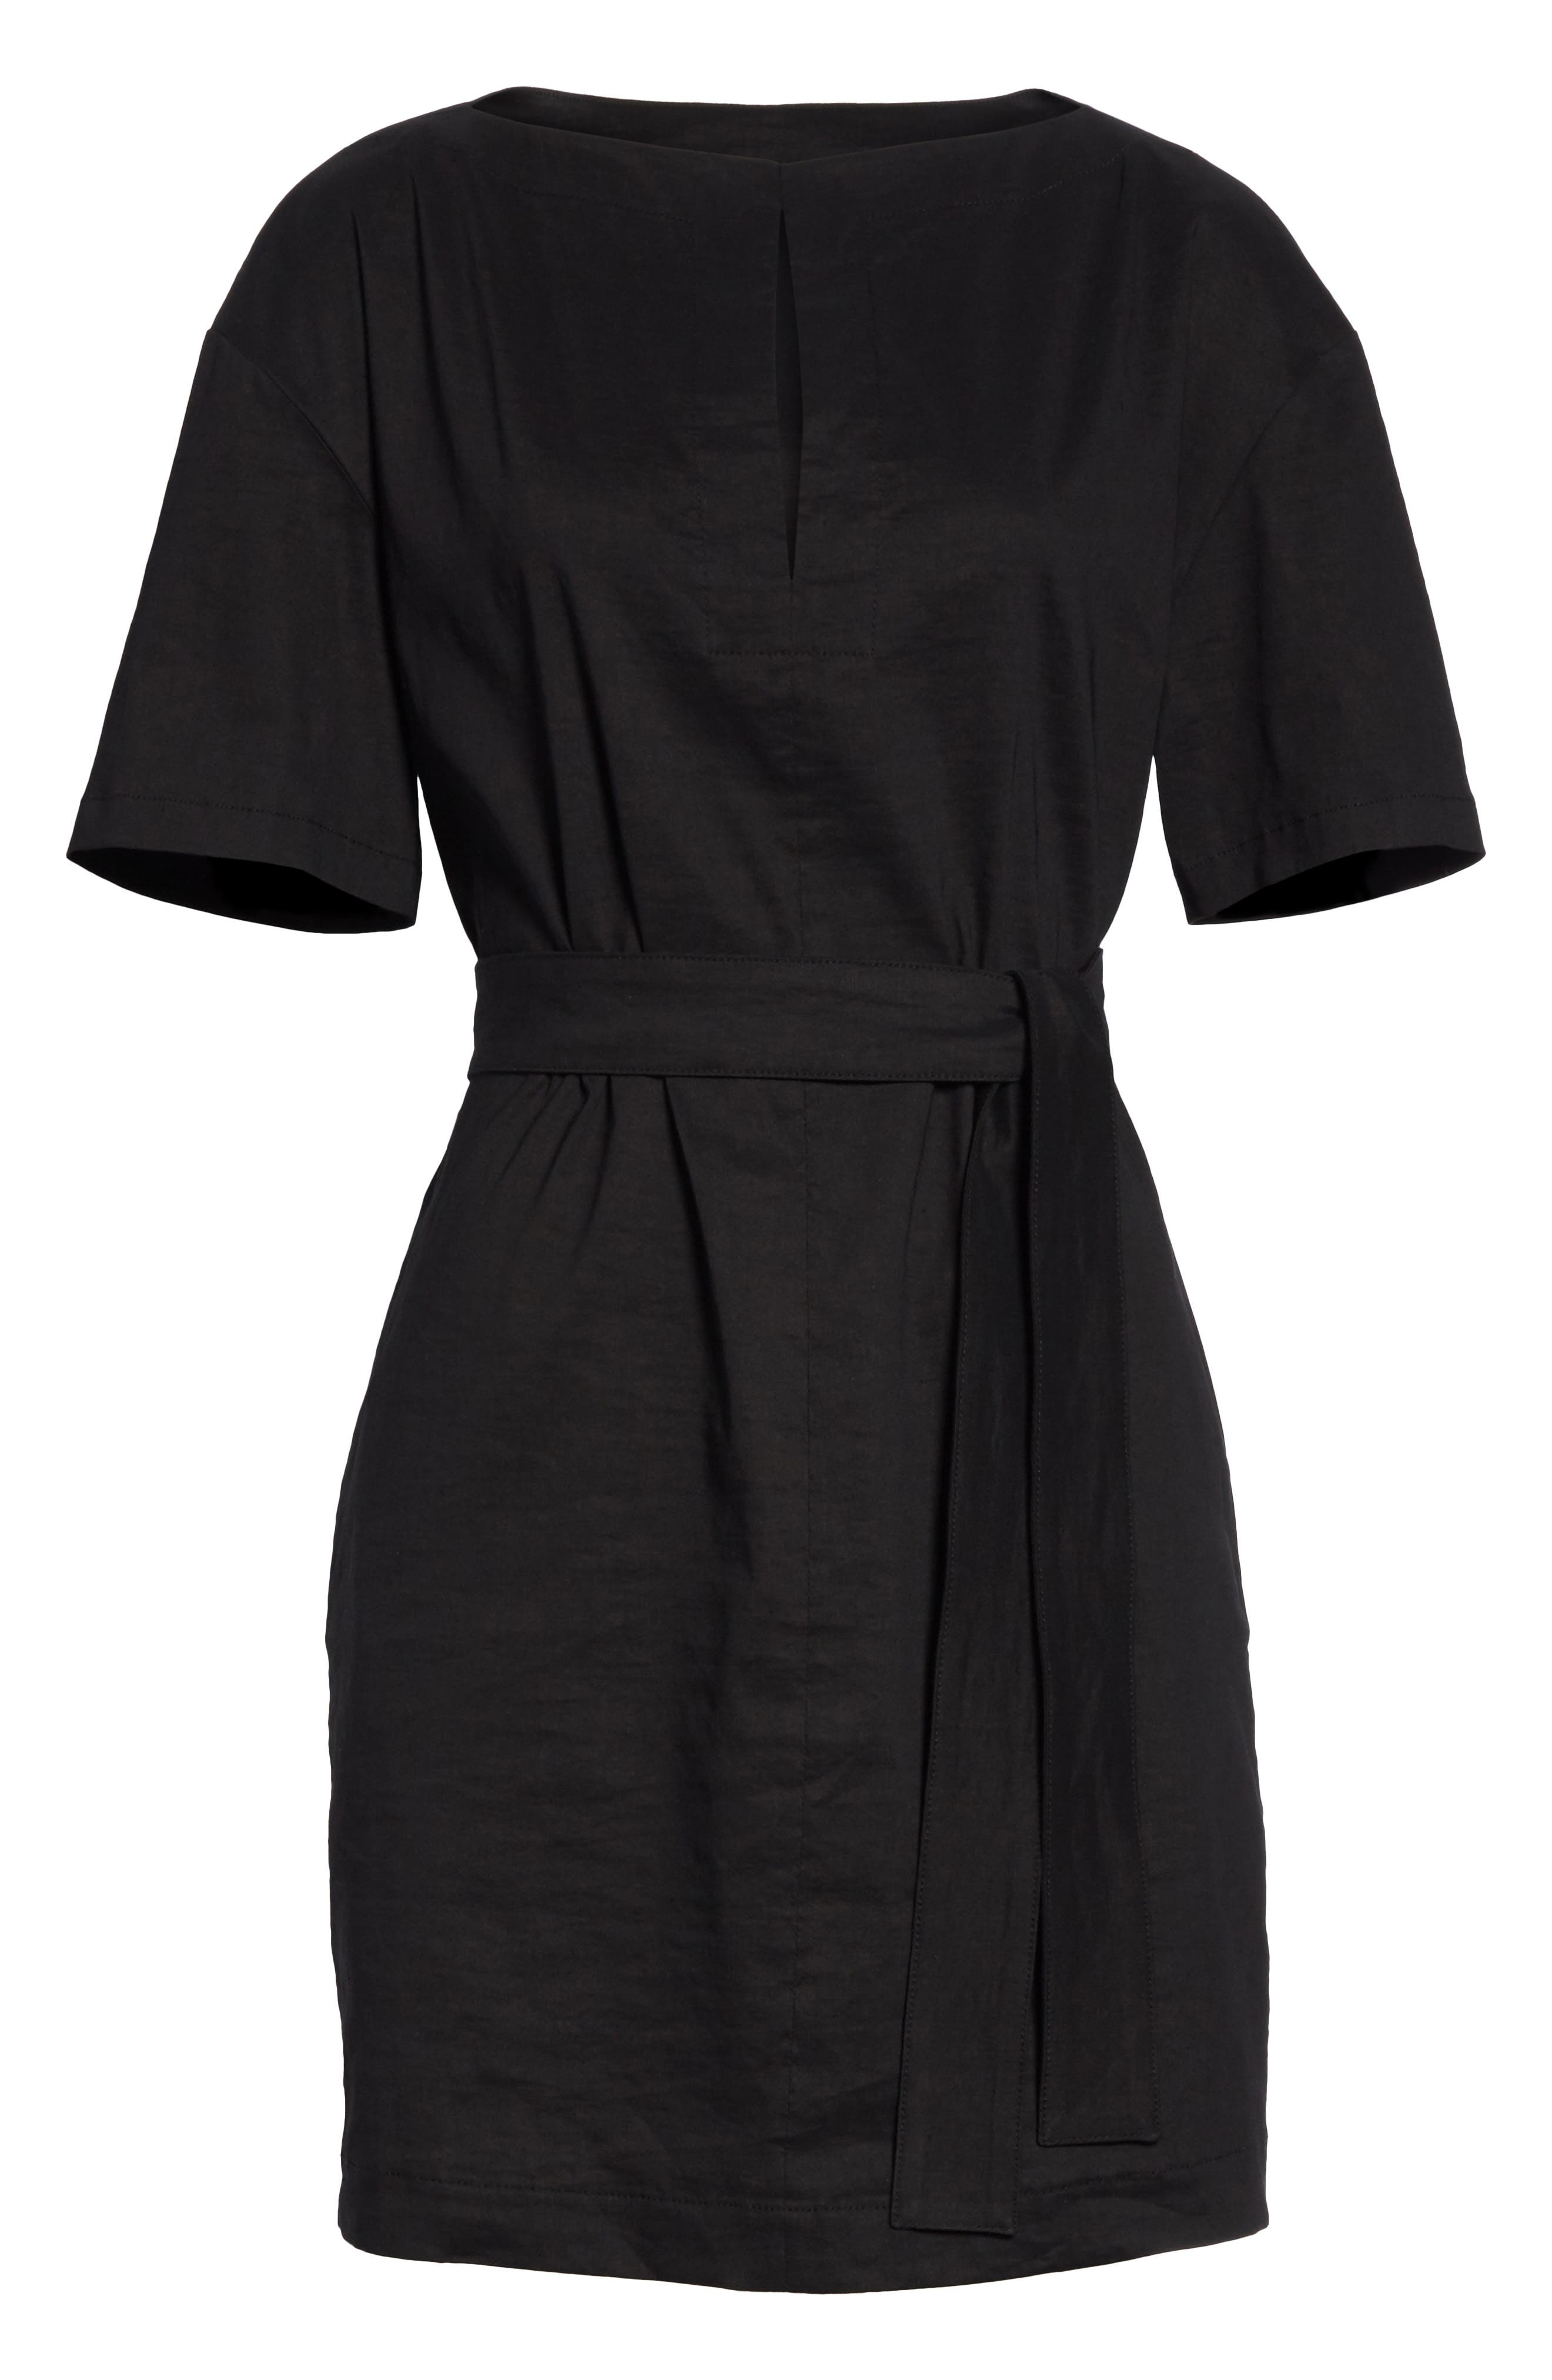 Belted Shift Dress,                             Alternate thumbnail 6, color,                             Black Multi